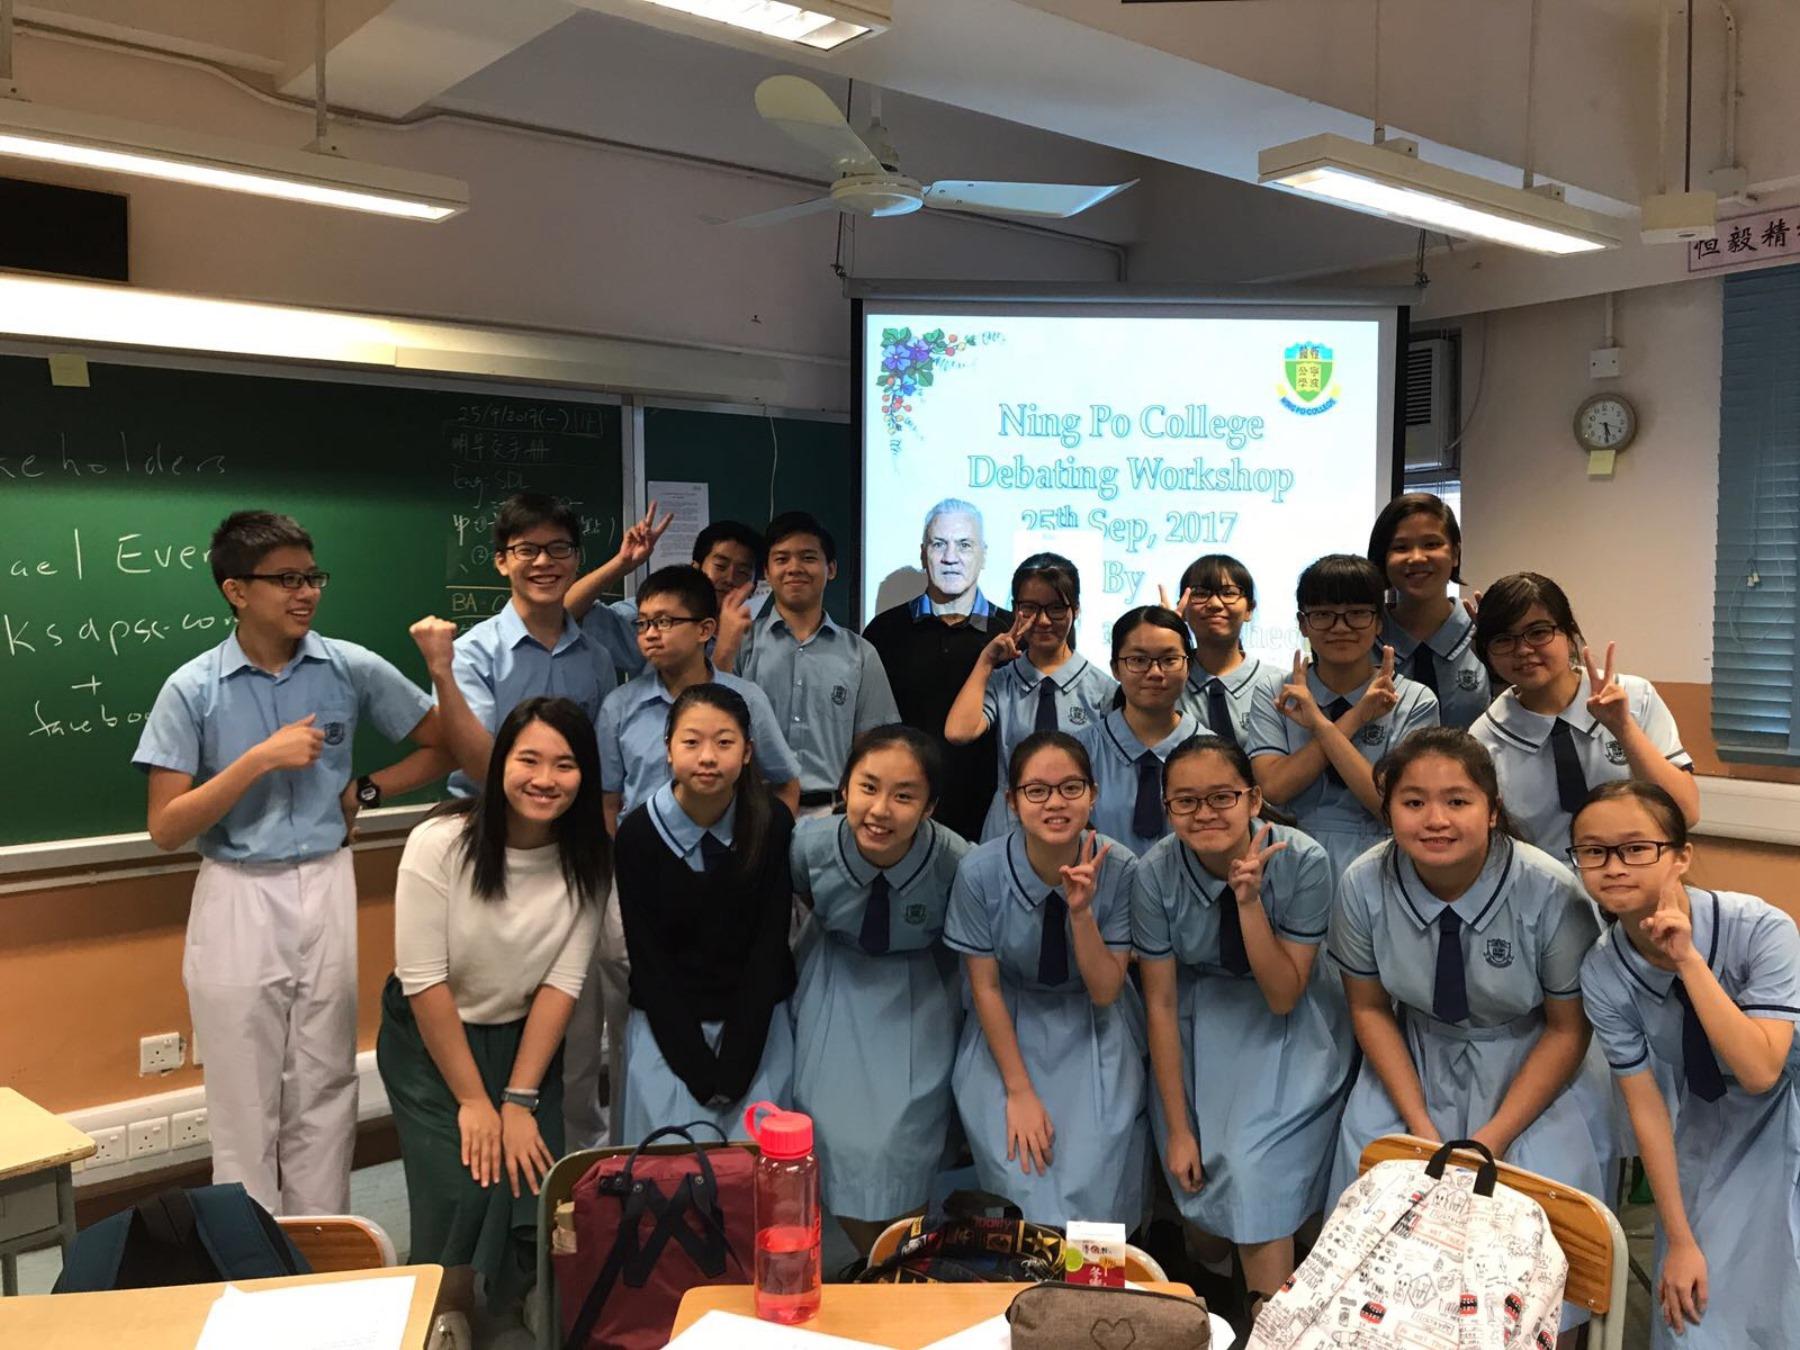 http://www.npc.edu.hk/sites/default/files/img_2934.jpg